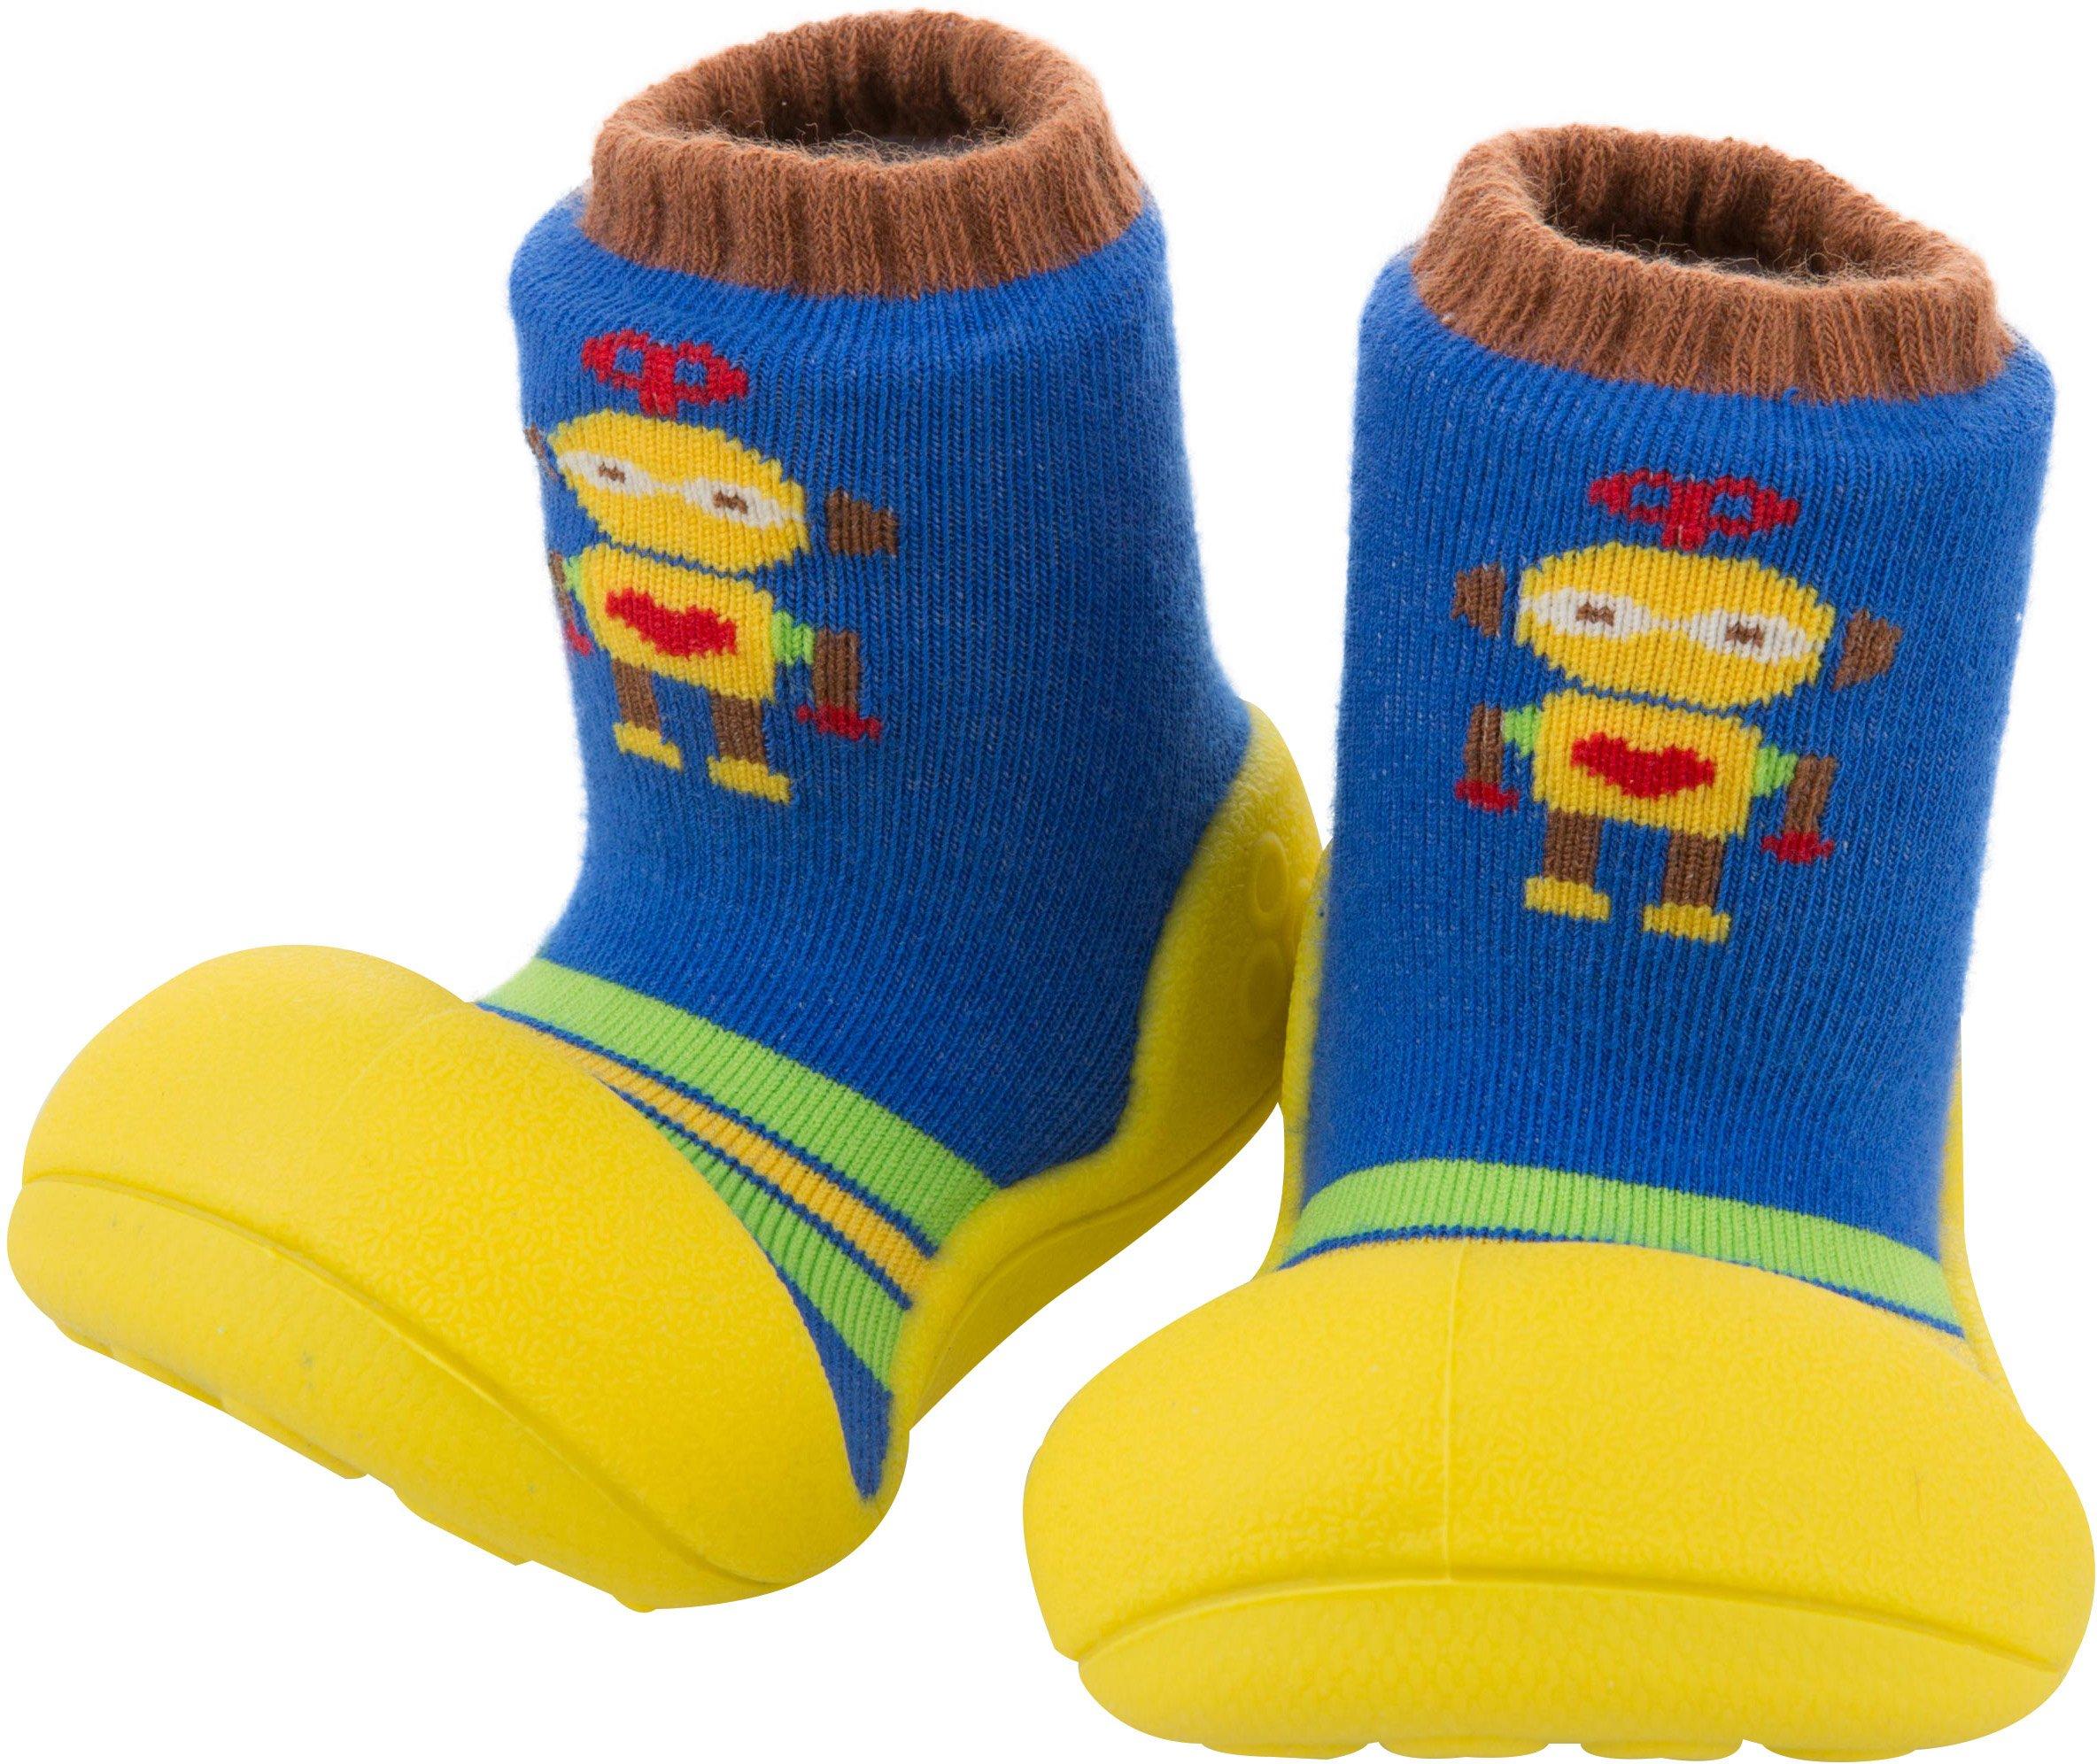 Attipas Healthy First Walker Shoes (Medium, Robot Yellow)